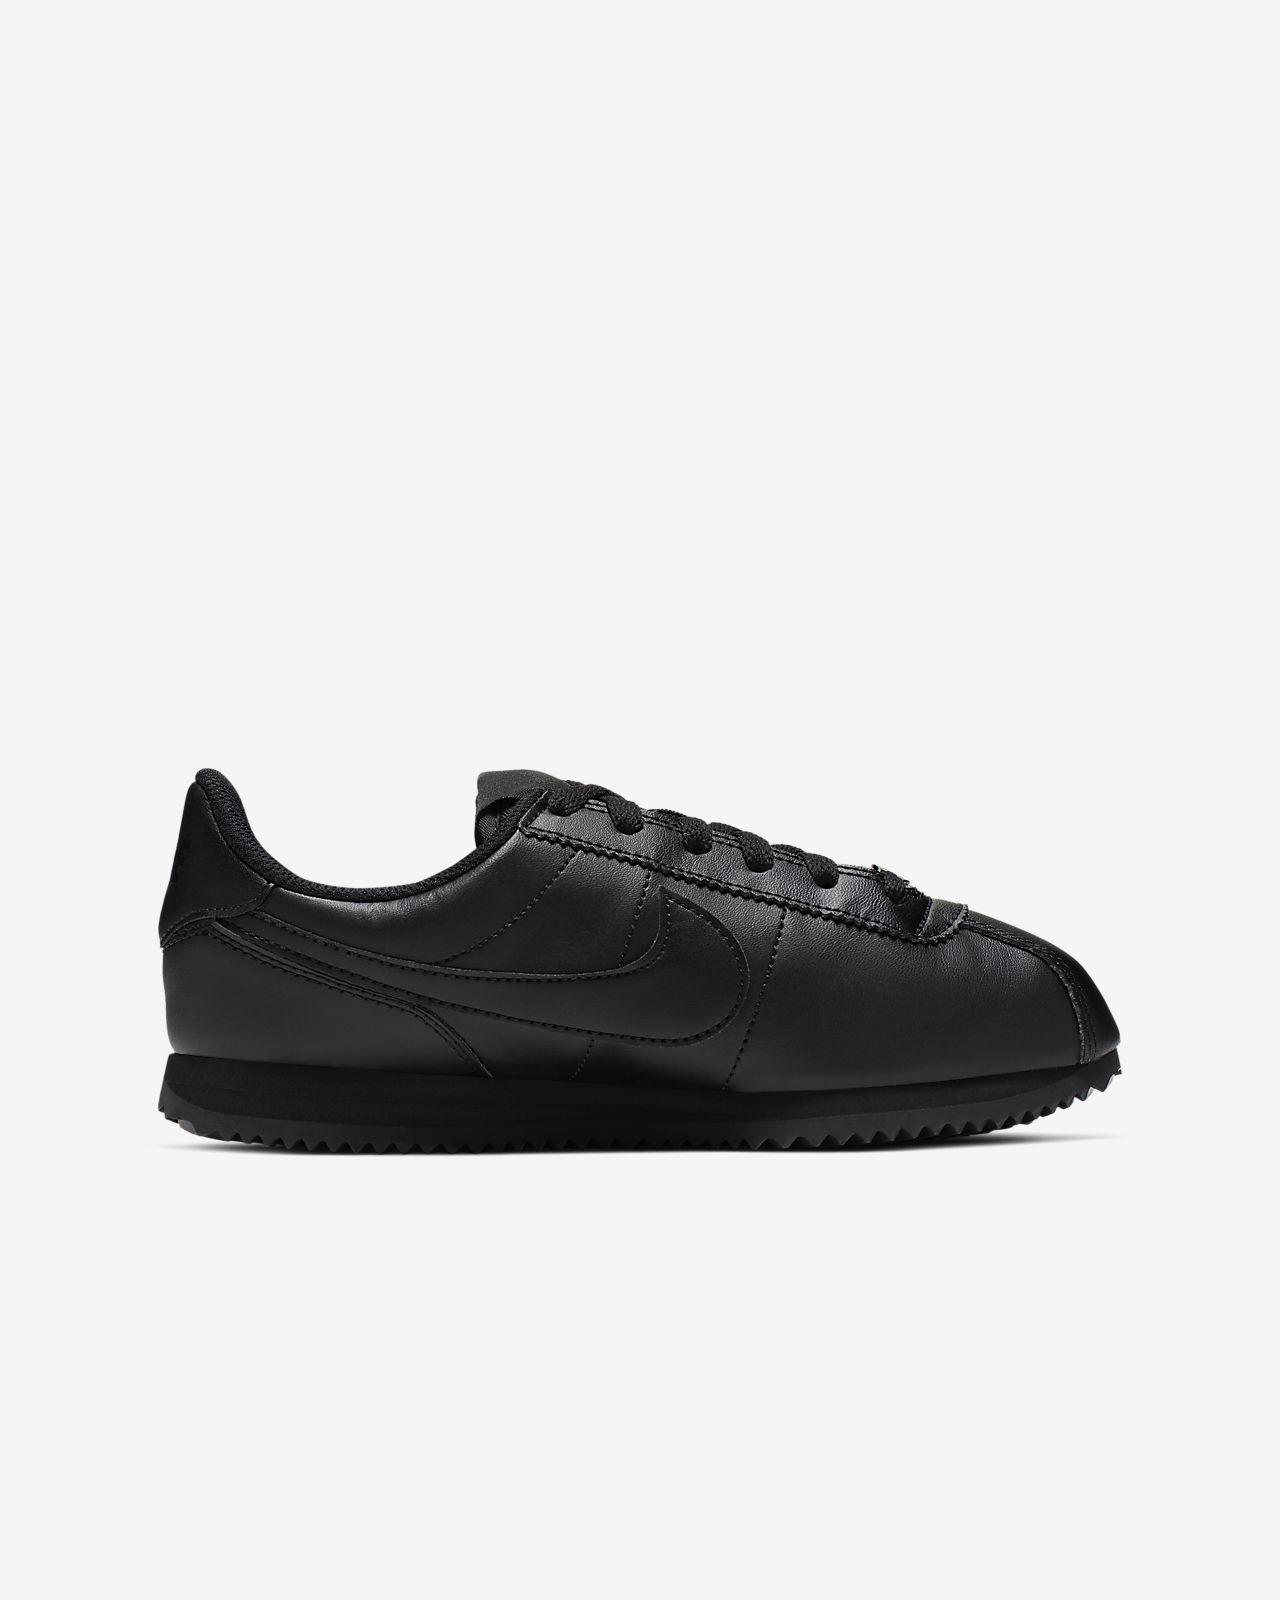 Cortez für Nike ältere SL Schuh Basic Kinder rdCxoeBW